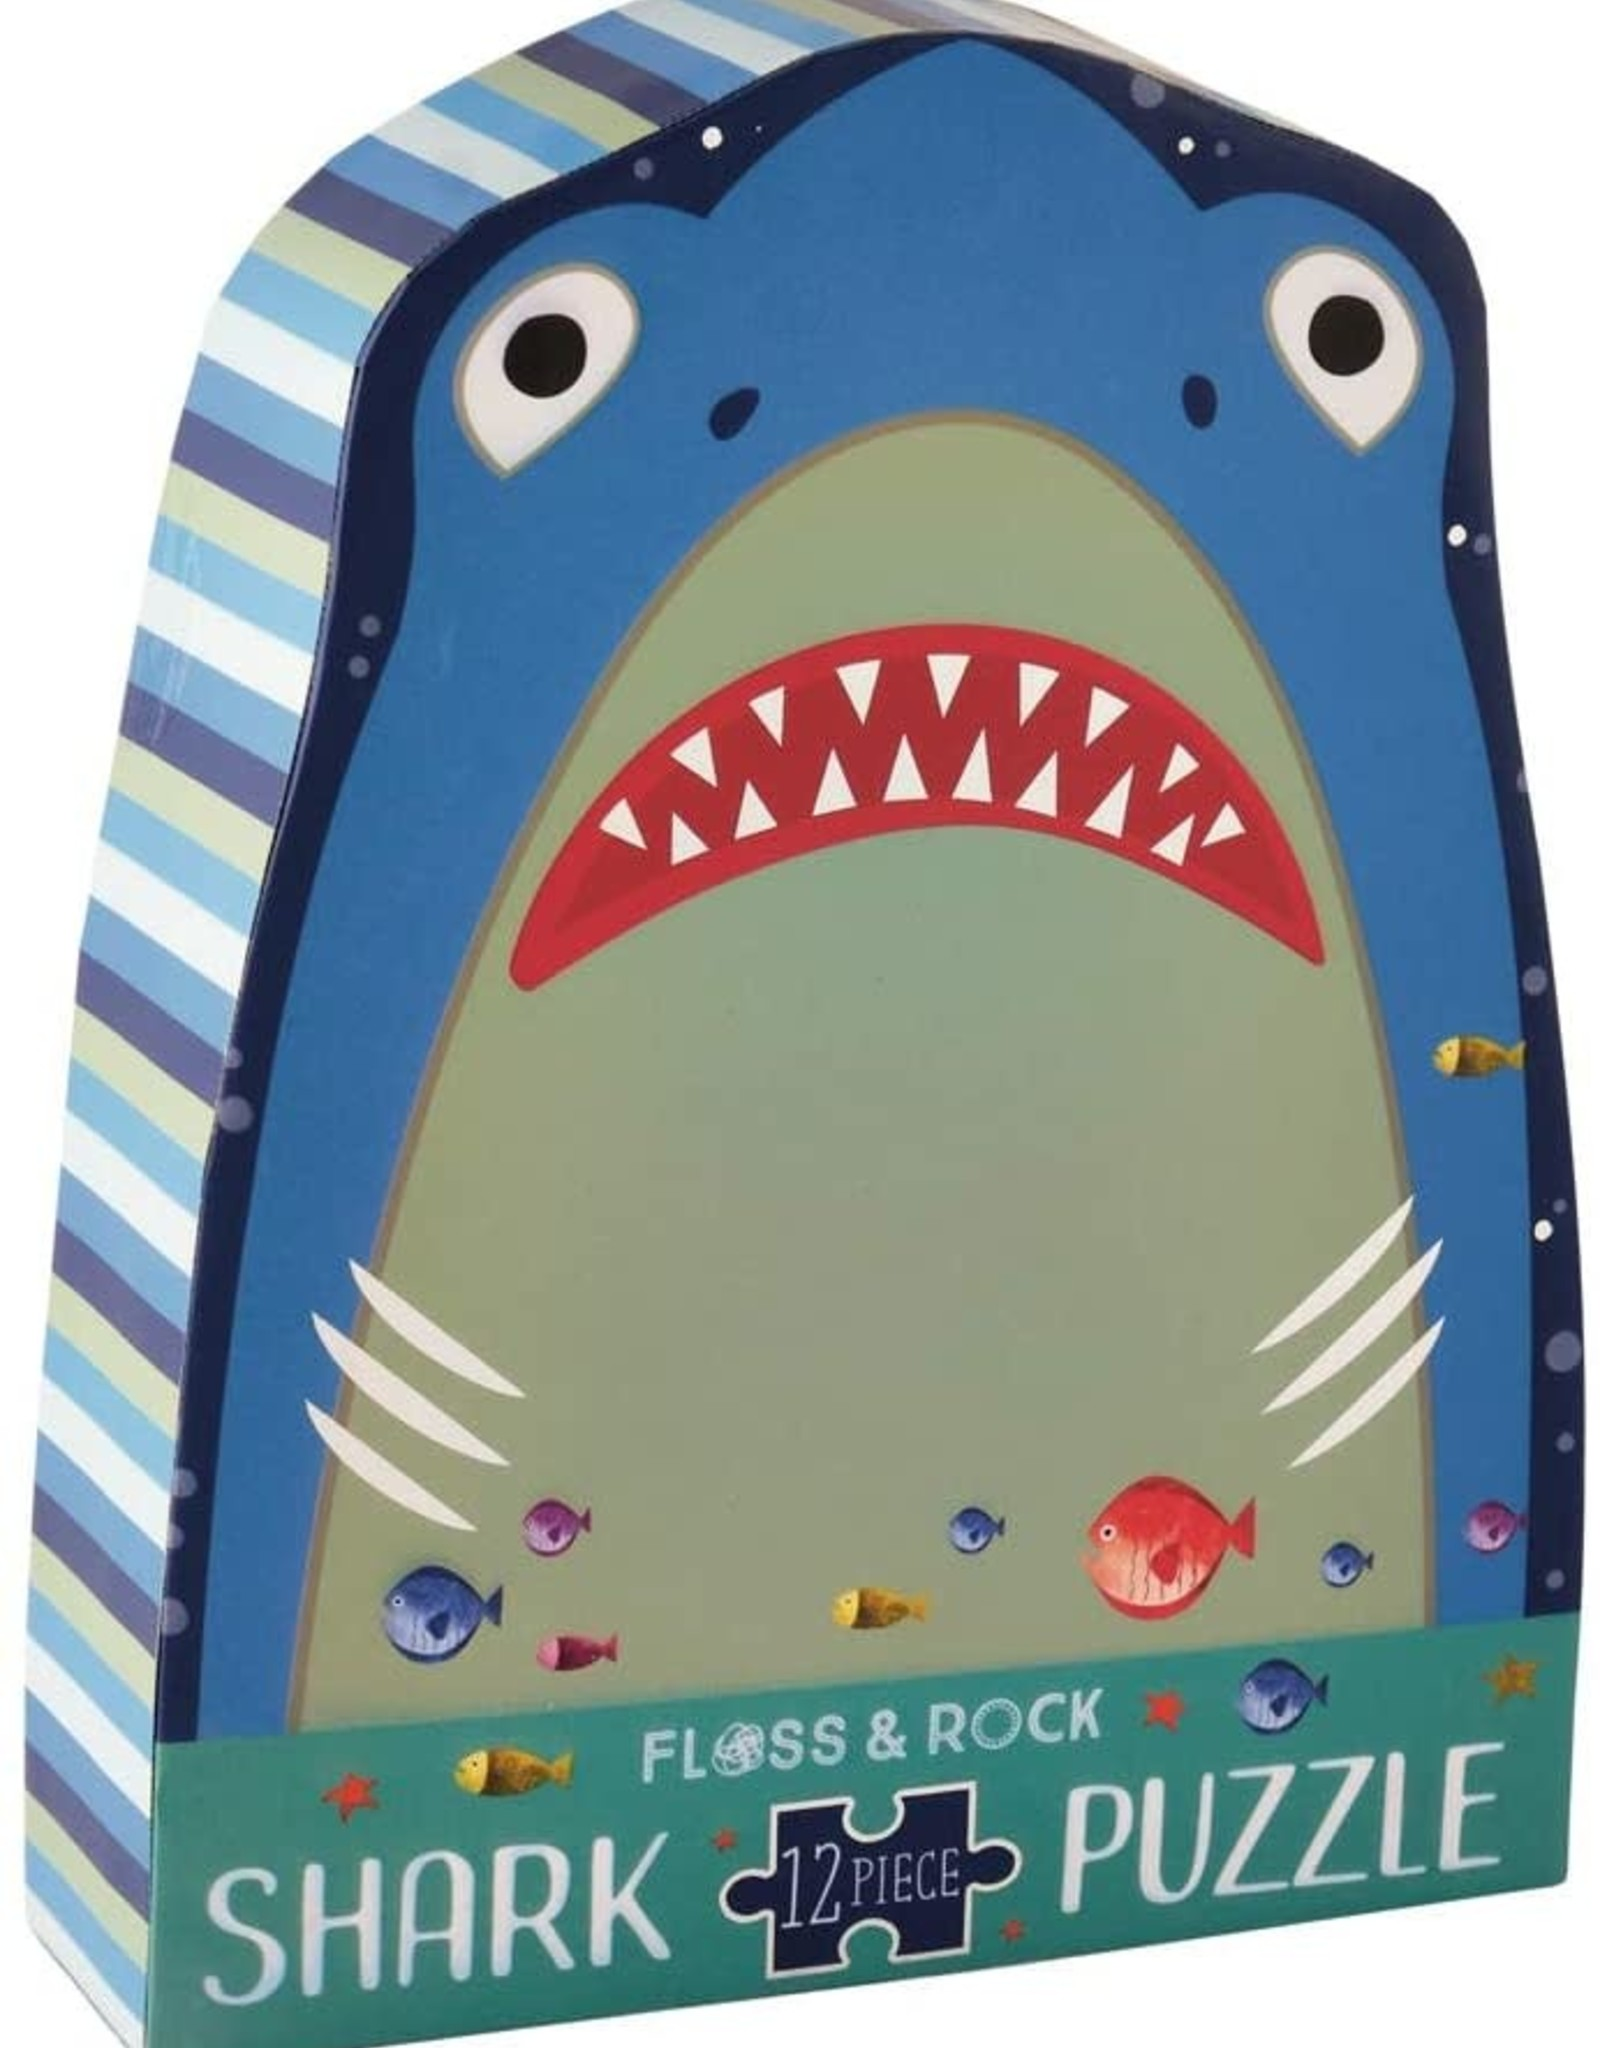 Floss & Rock 12 pc Shark Shaped Puzzle